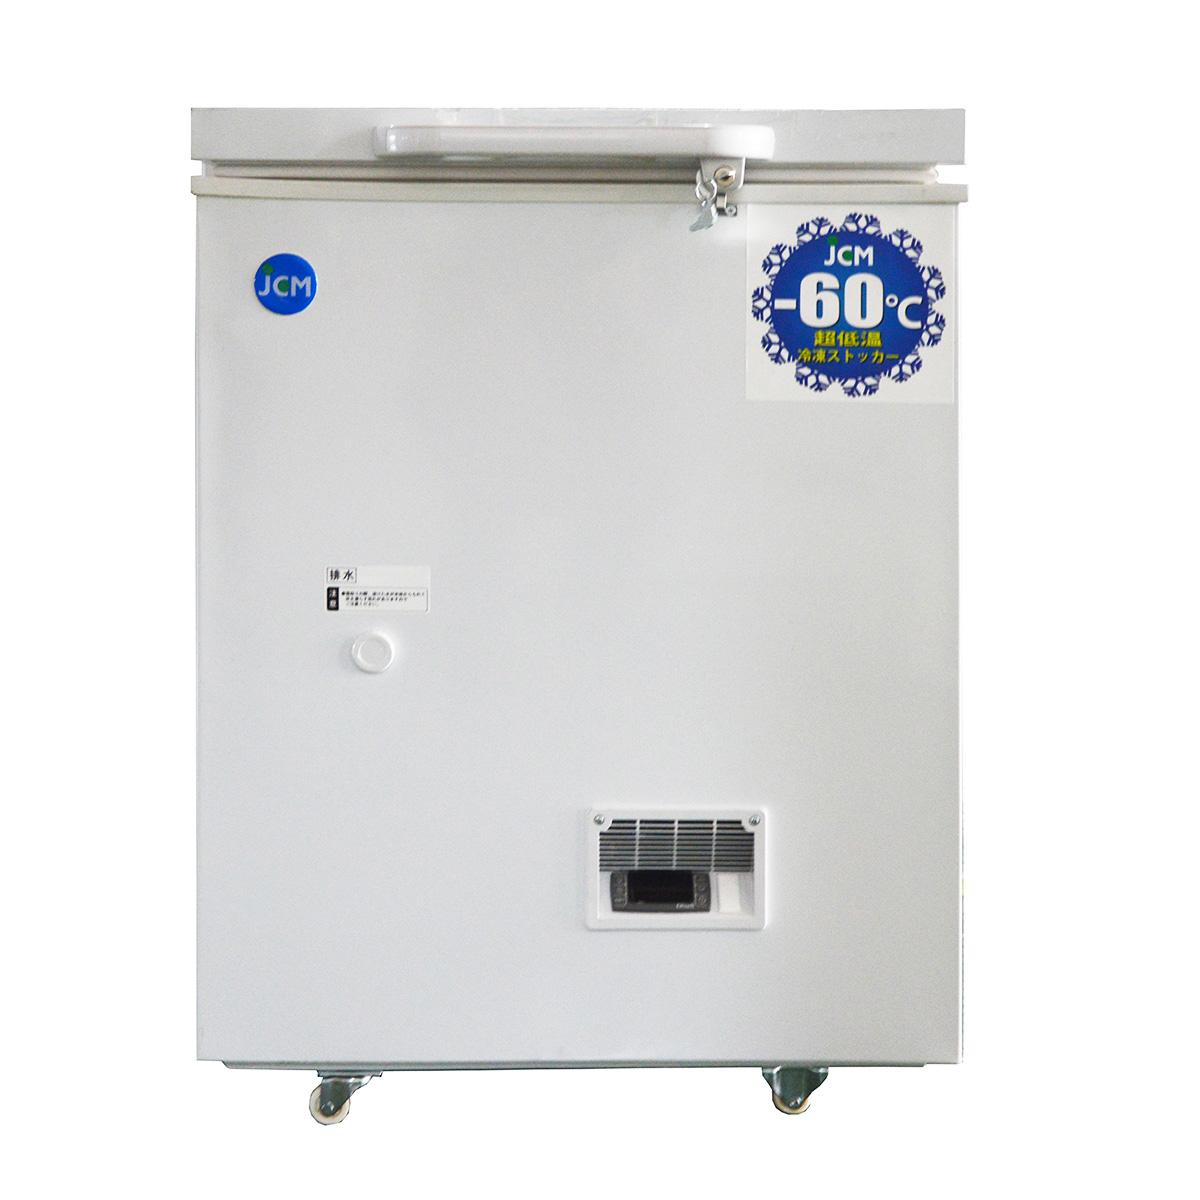 JCM 超低温冷凍ストッカー 66L JCMCC-60 業務用 -60℃ 超低温 冷凍庫 冷凍ストッカー ストッカー 【代引不可】